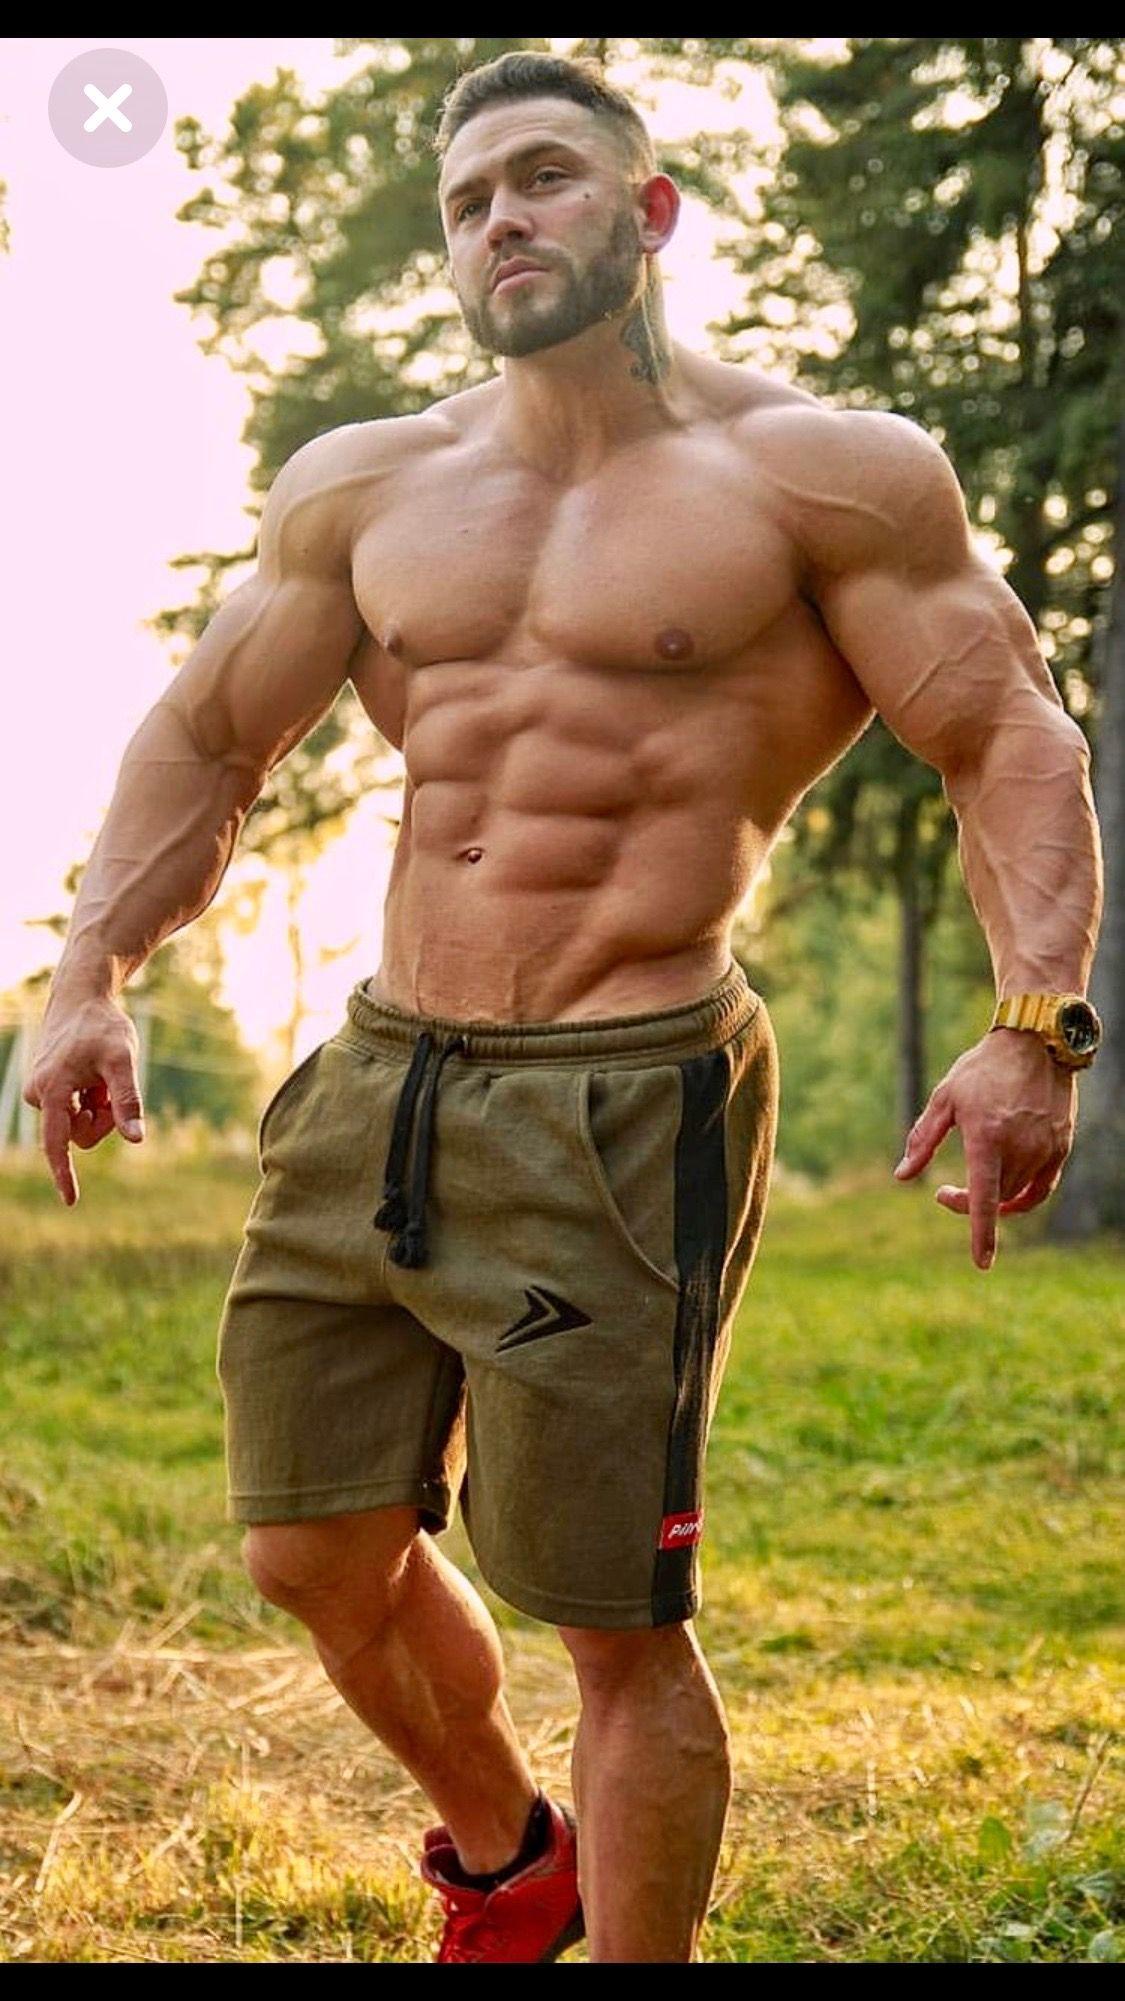 Pin by craig kruse on muscle muscle men bodybuilders